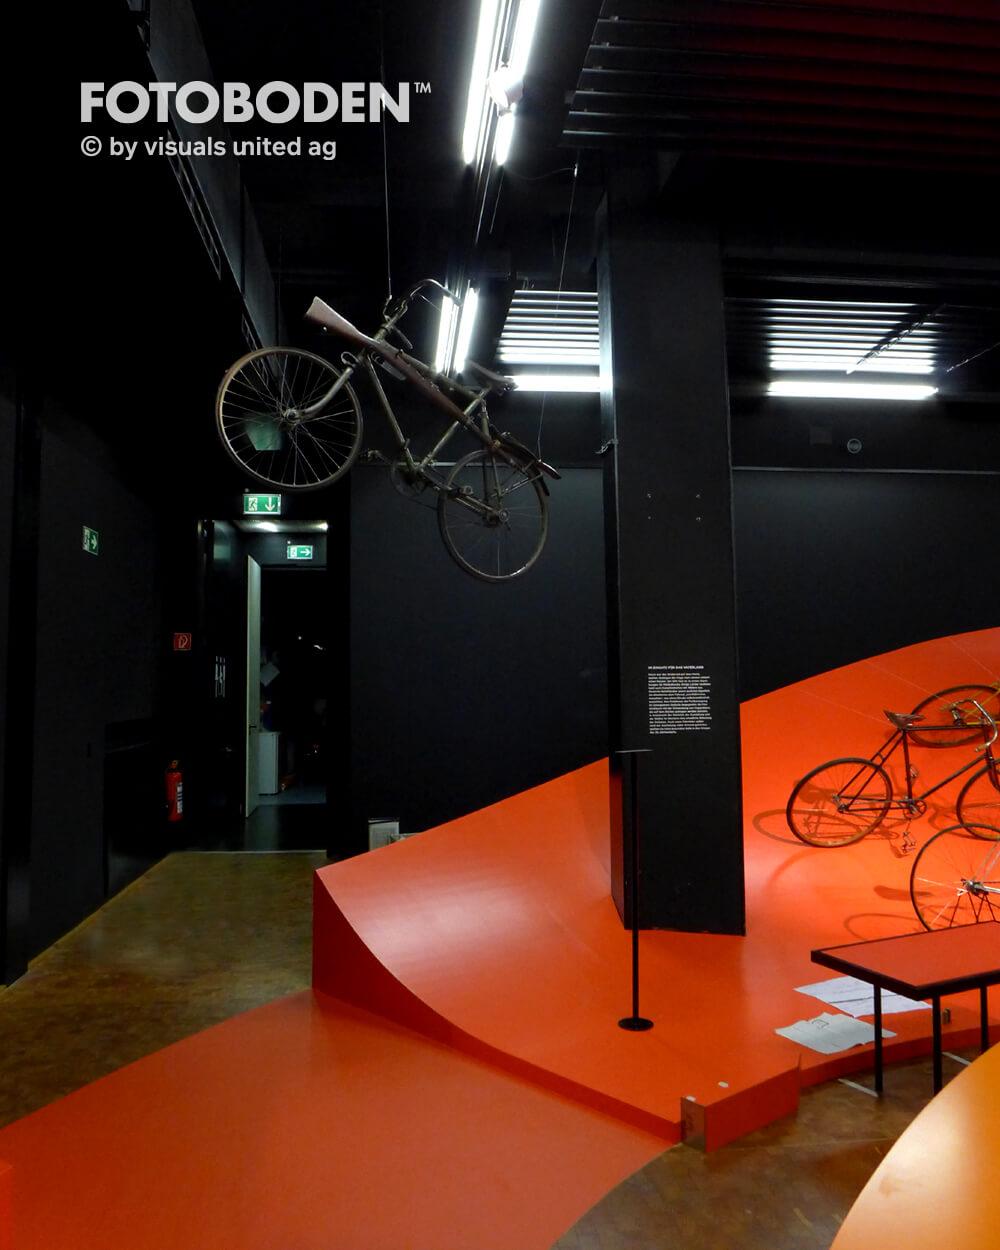 Fahrrad 1Ausstellung Museum  Raumkonzept Stimmung Museumsboden Ausstellungsboden Fotoboden Vinylboden Flooring Individuell Event